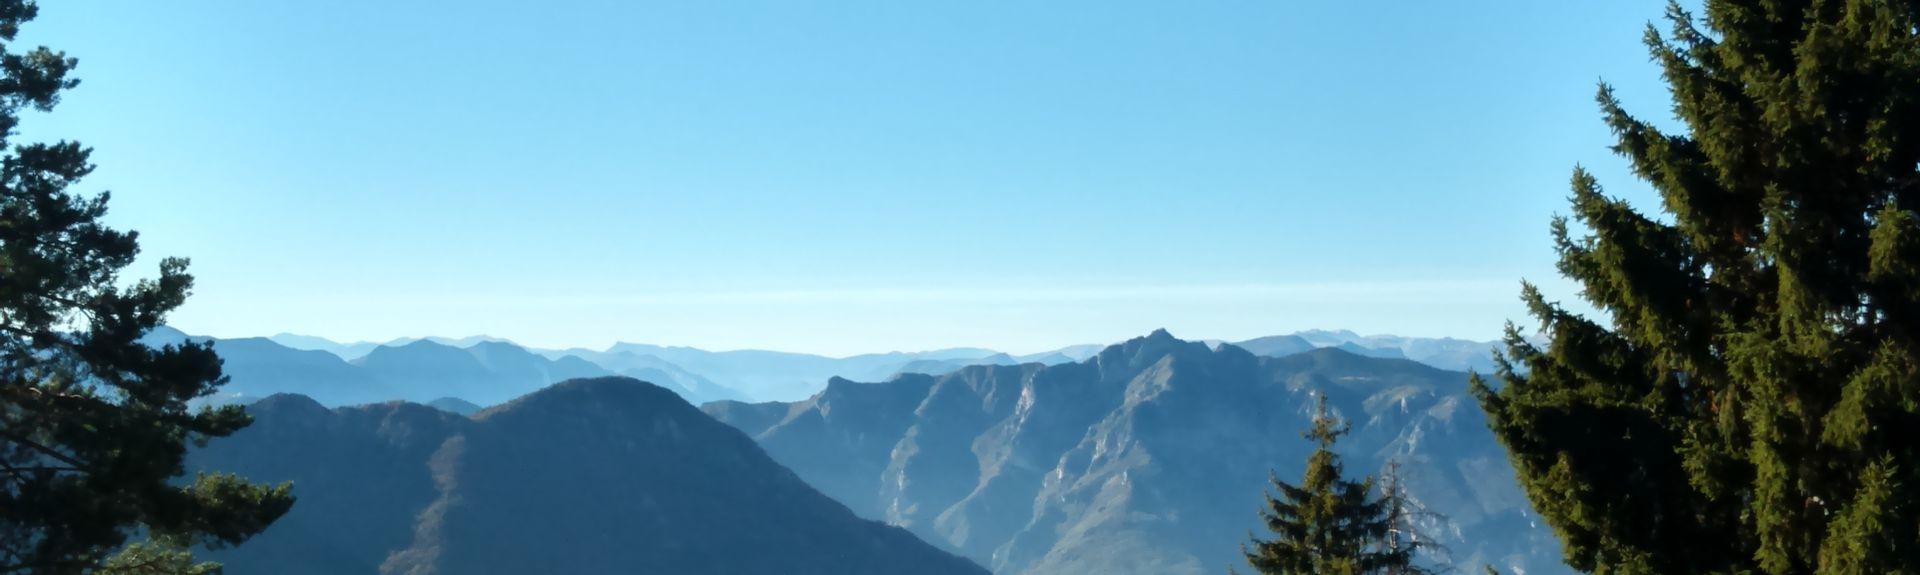 Sospel, Alpes-Maritimes, France